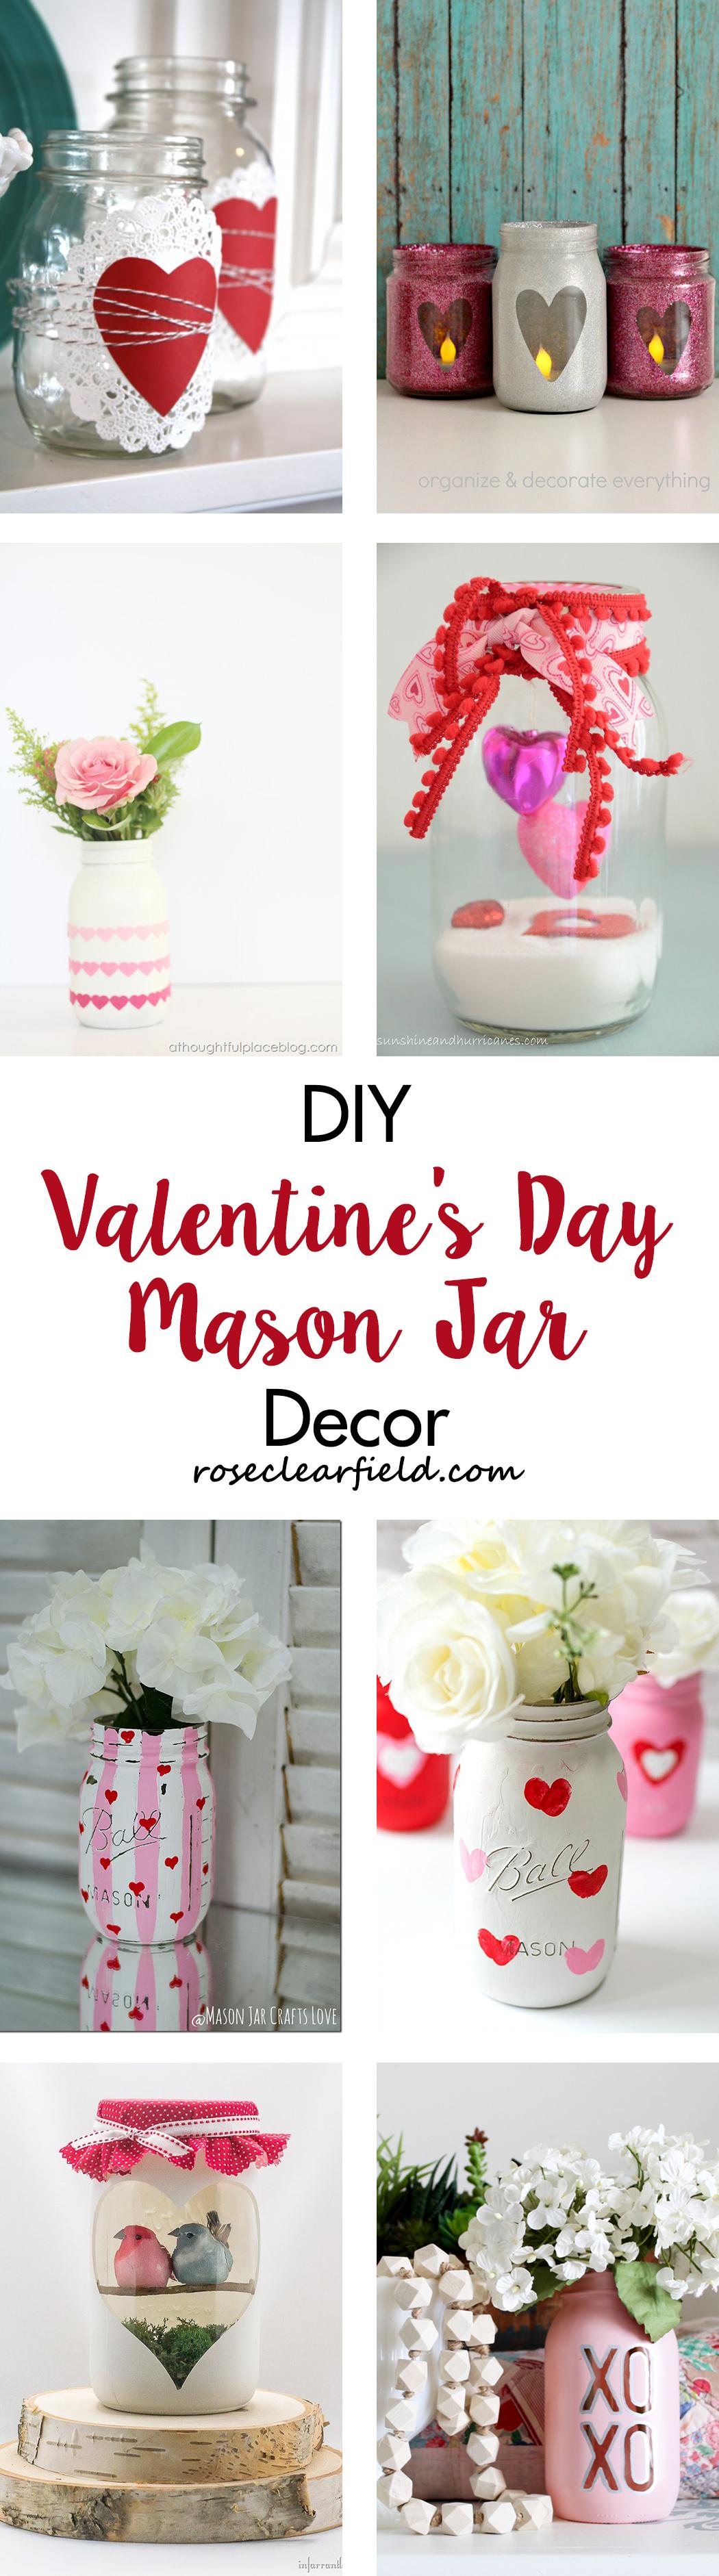 DIY Valentine's Day Mason Jar Decor | https://www.roseclearfield.com